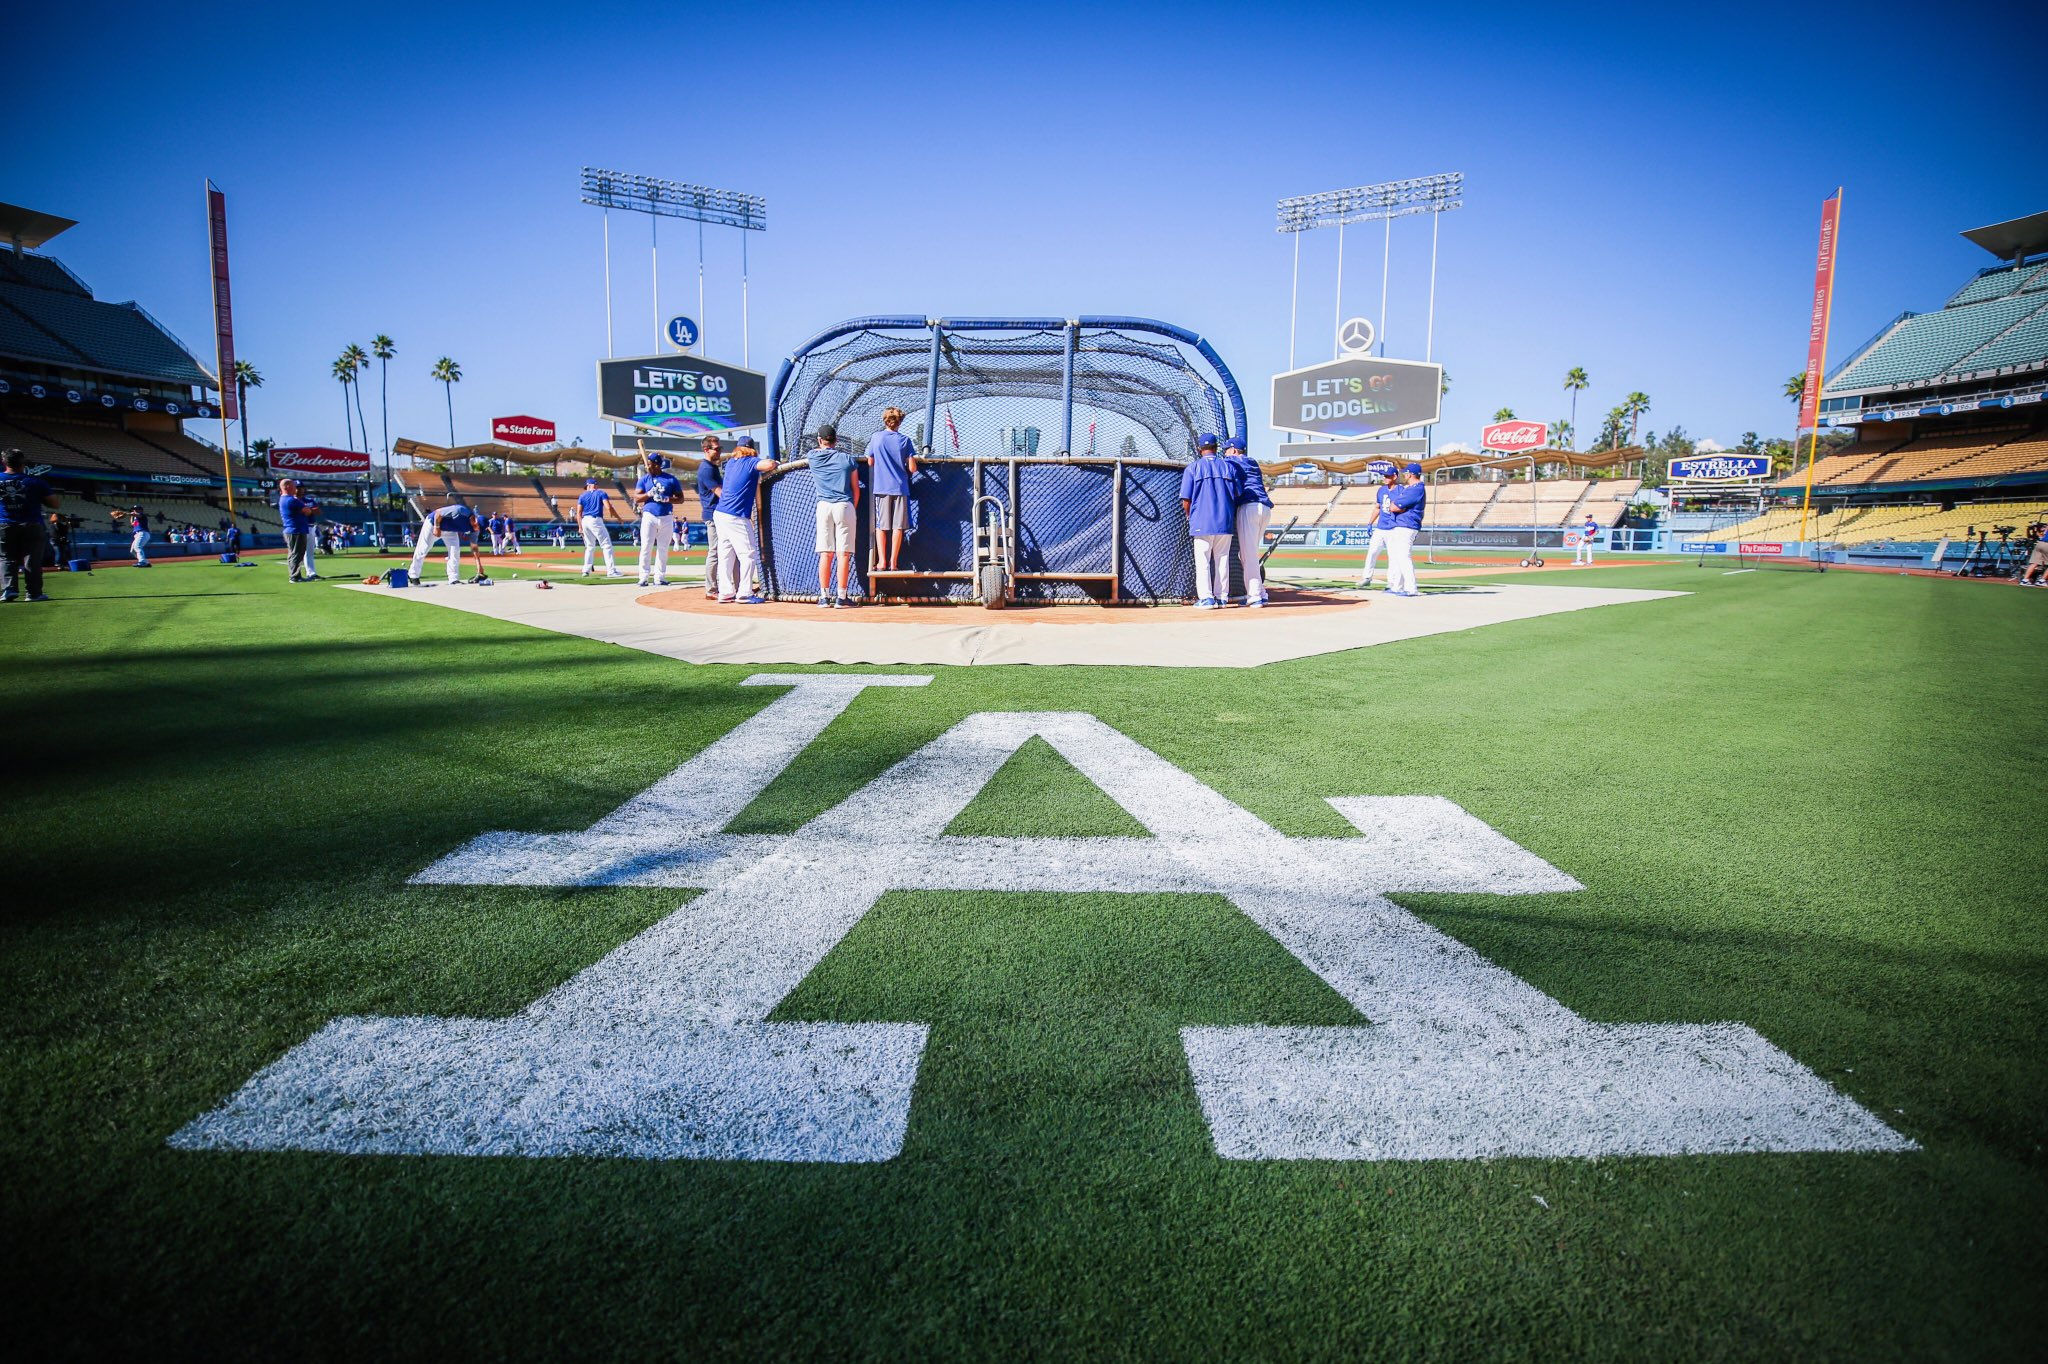 Warming up. �� #DodgersBP https://t.co/0SHTV3wDka